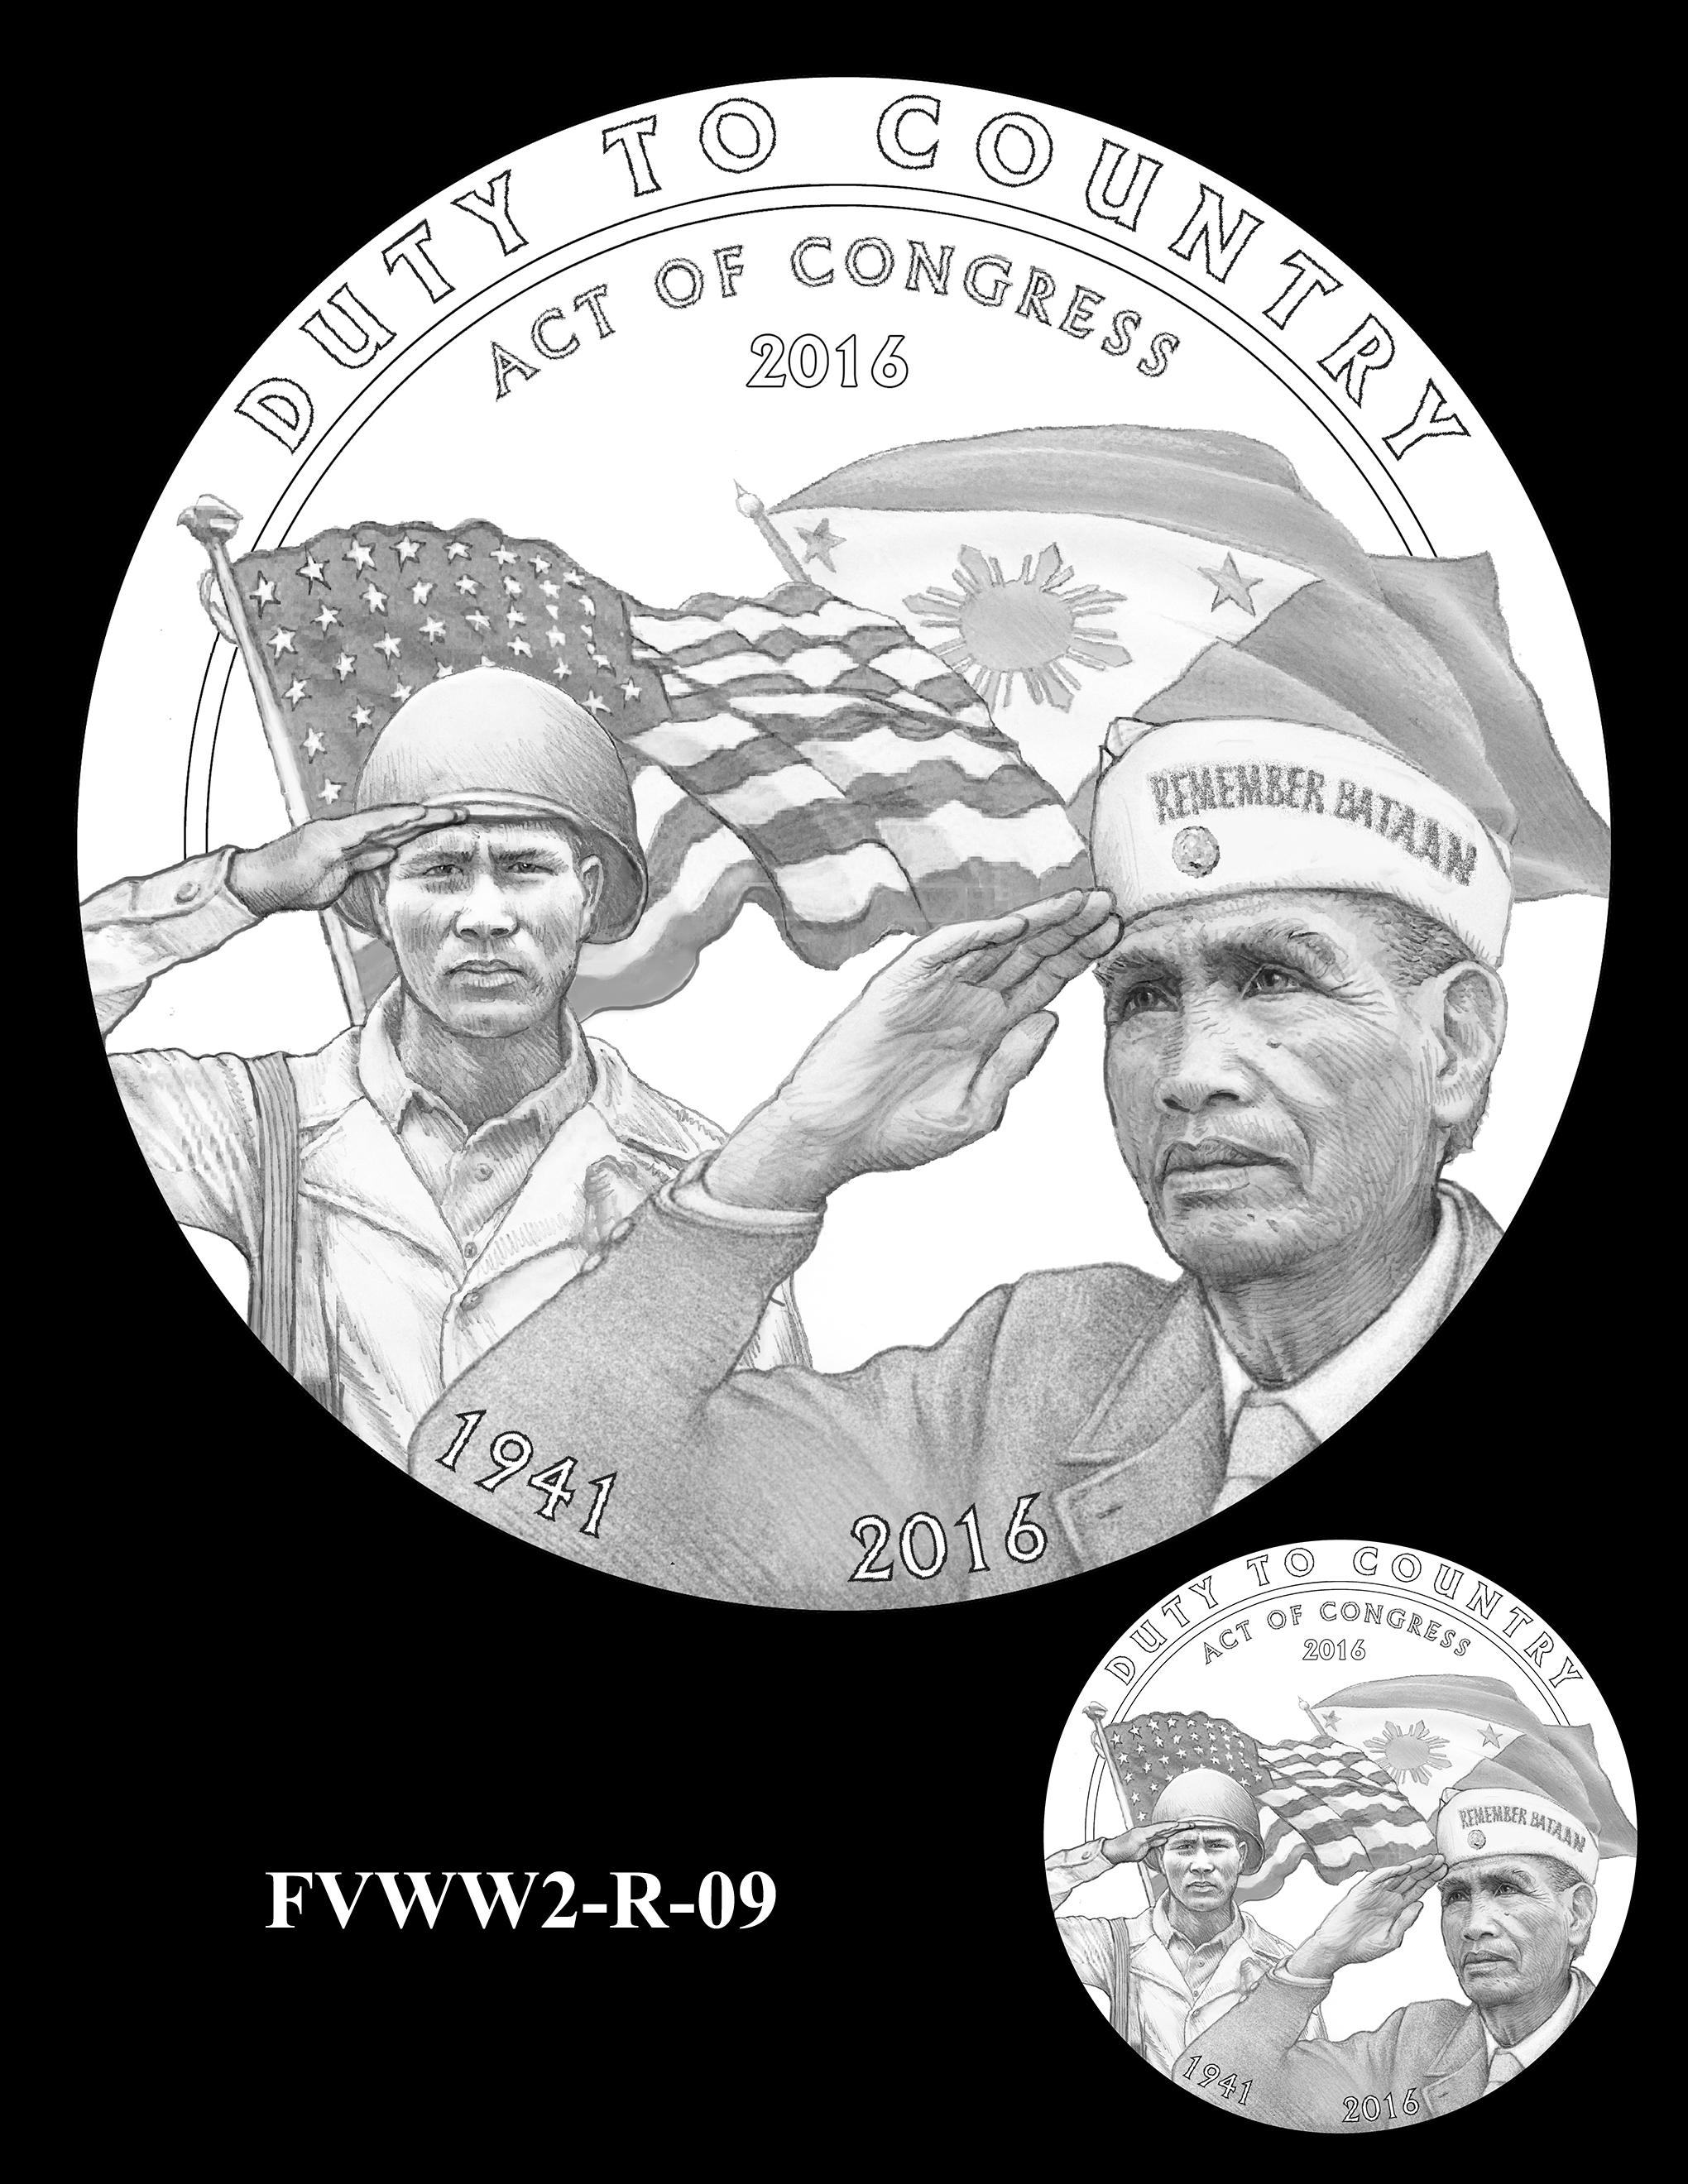 FVWW2-R-09 -- Filipino Veterans of World War II Congressional Gold Medal